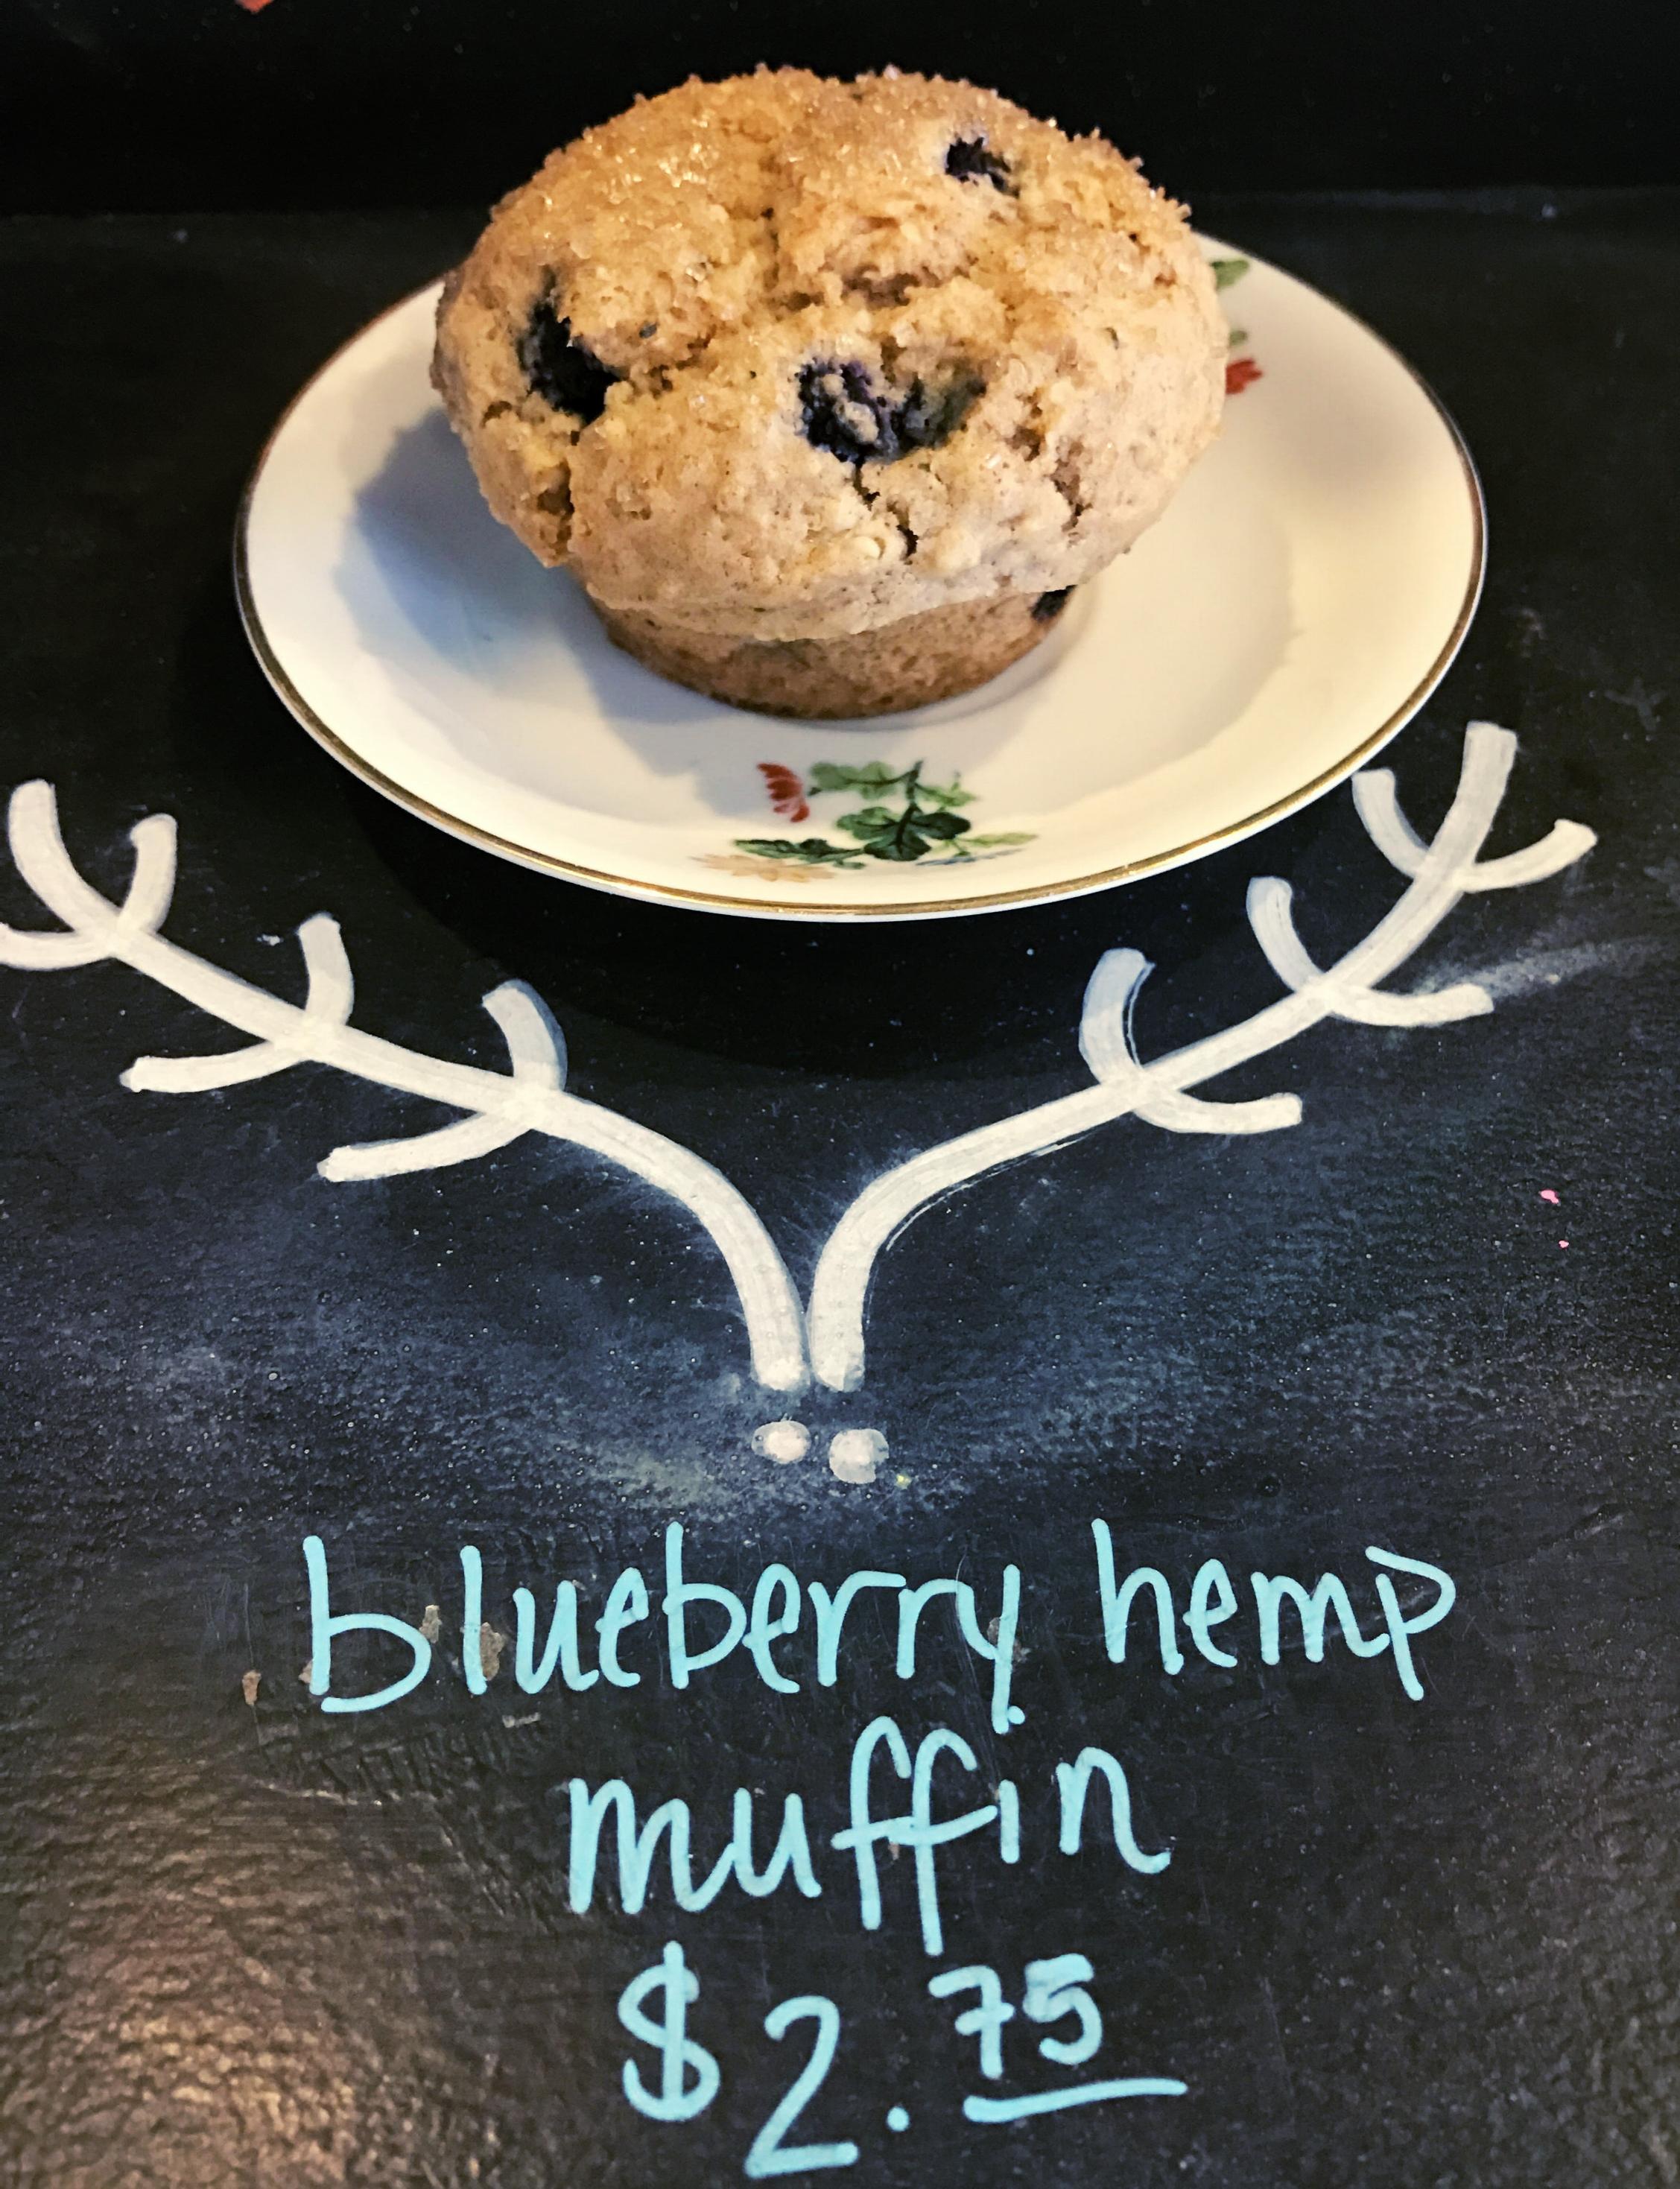 Urbann Arbor_Luncroom Blueberry muffin.jpg